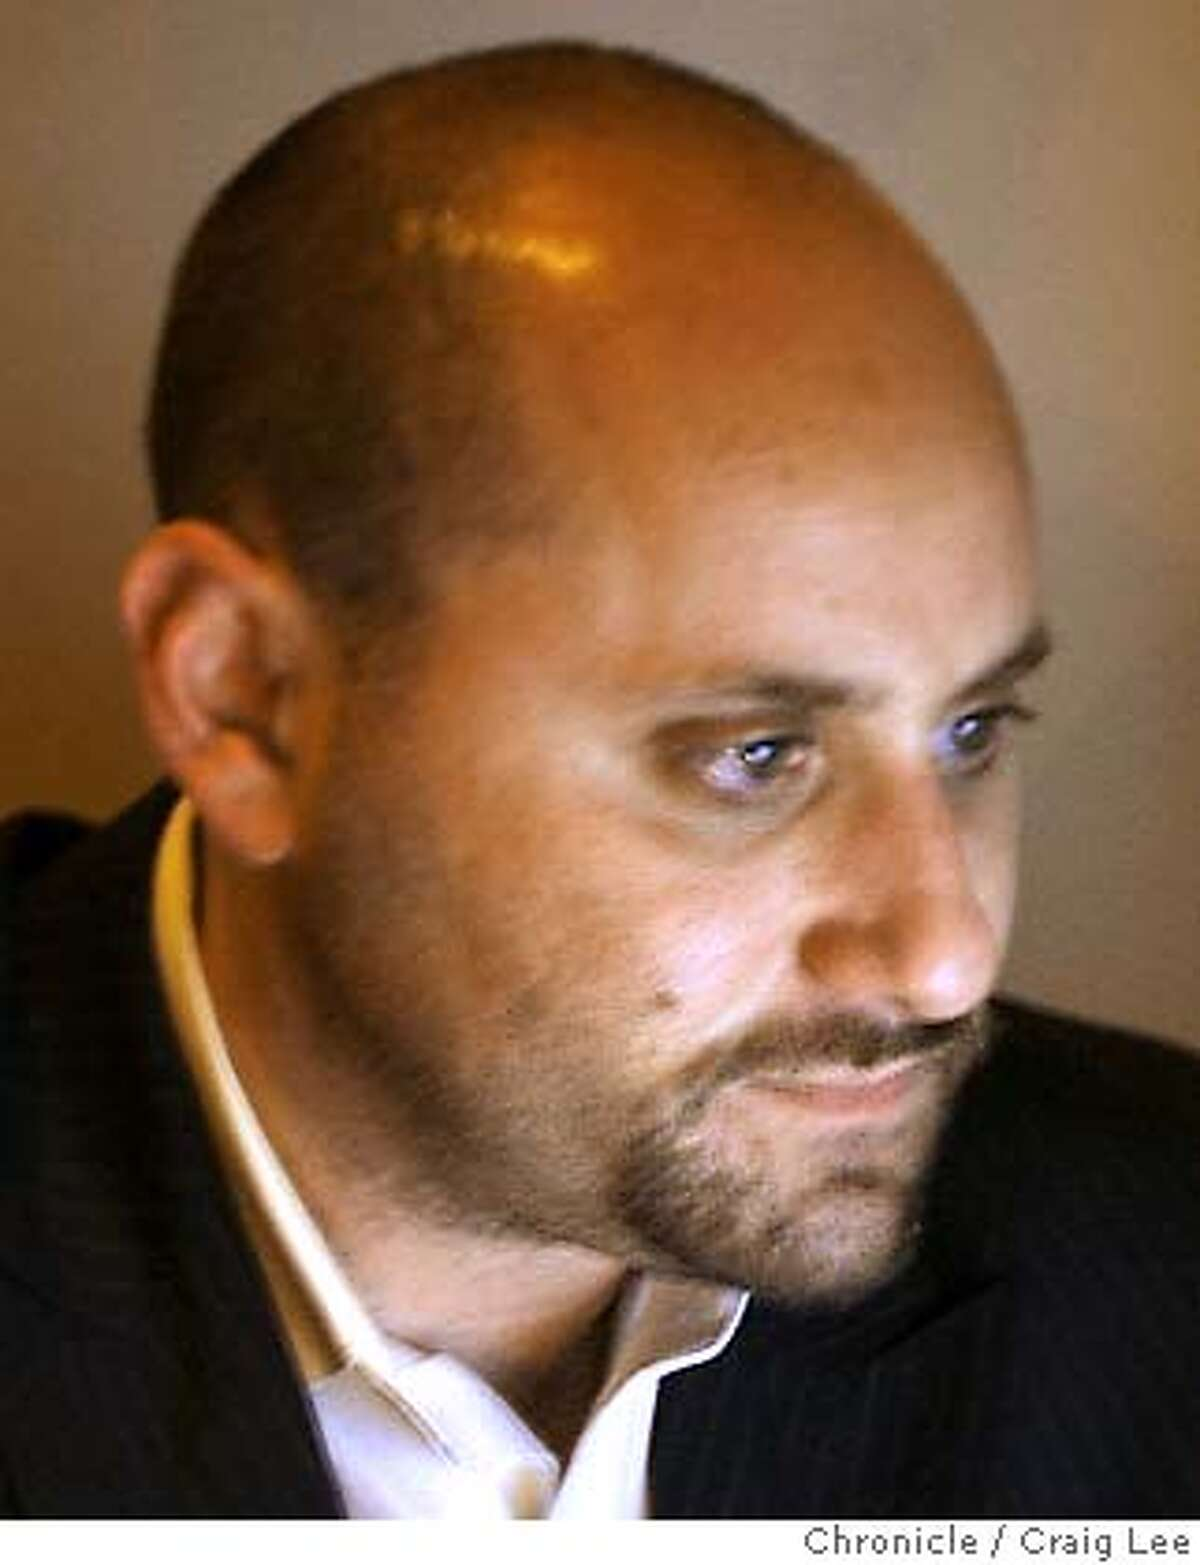 Alex Tourk, Mayor Gavin Newsom's former campaign manager. Chronicle photo by Craig Lee